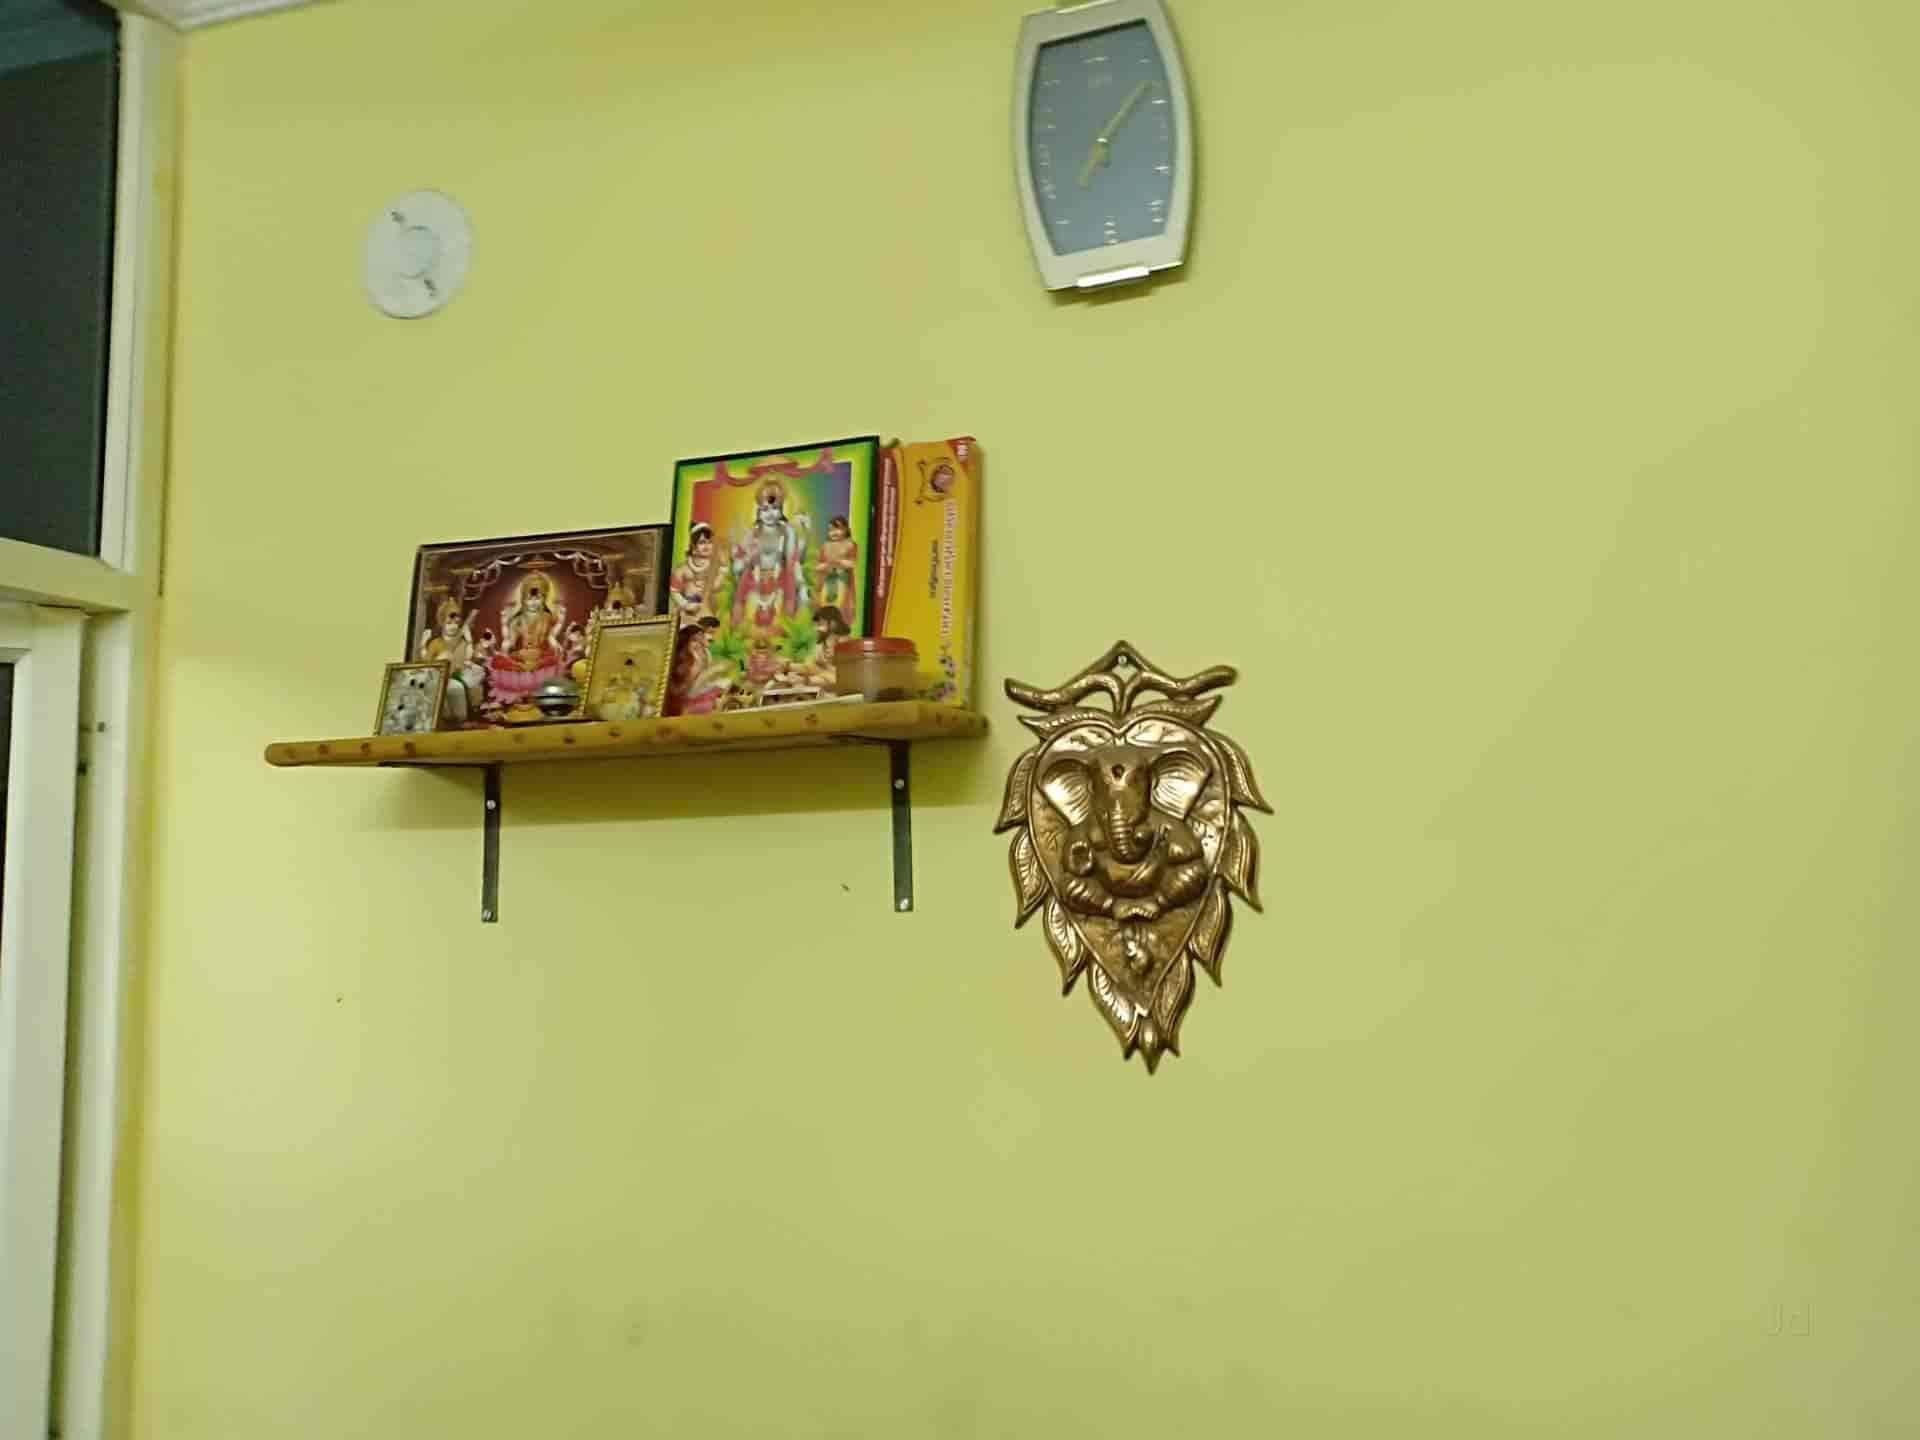 Parvathaneni Marraiage Consultancy, Kukatpally - Matrimonial Bureaus